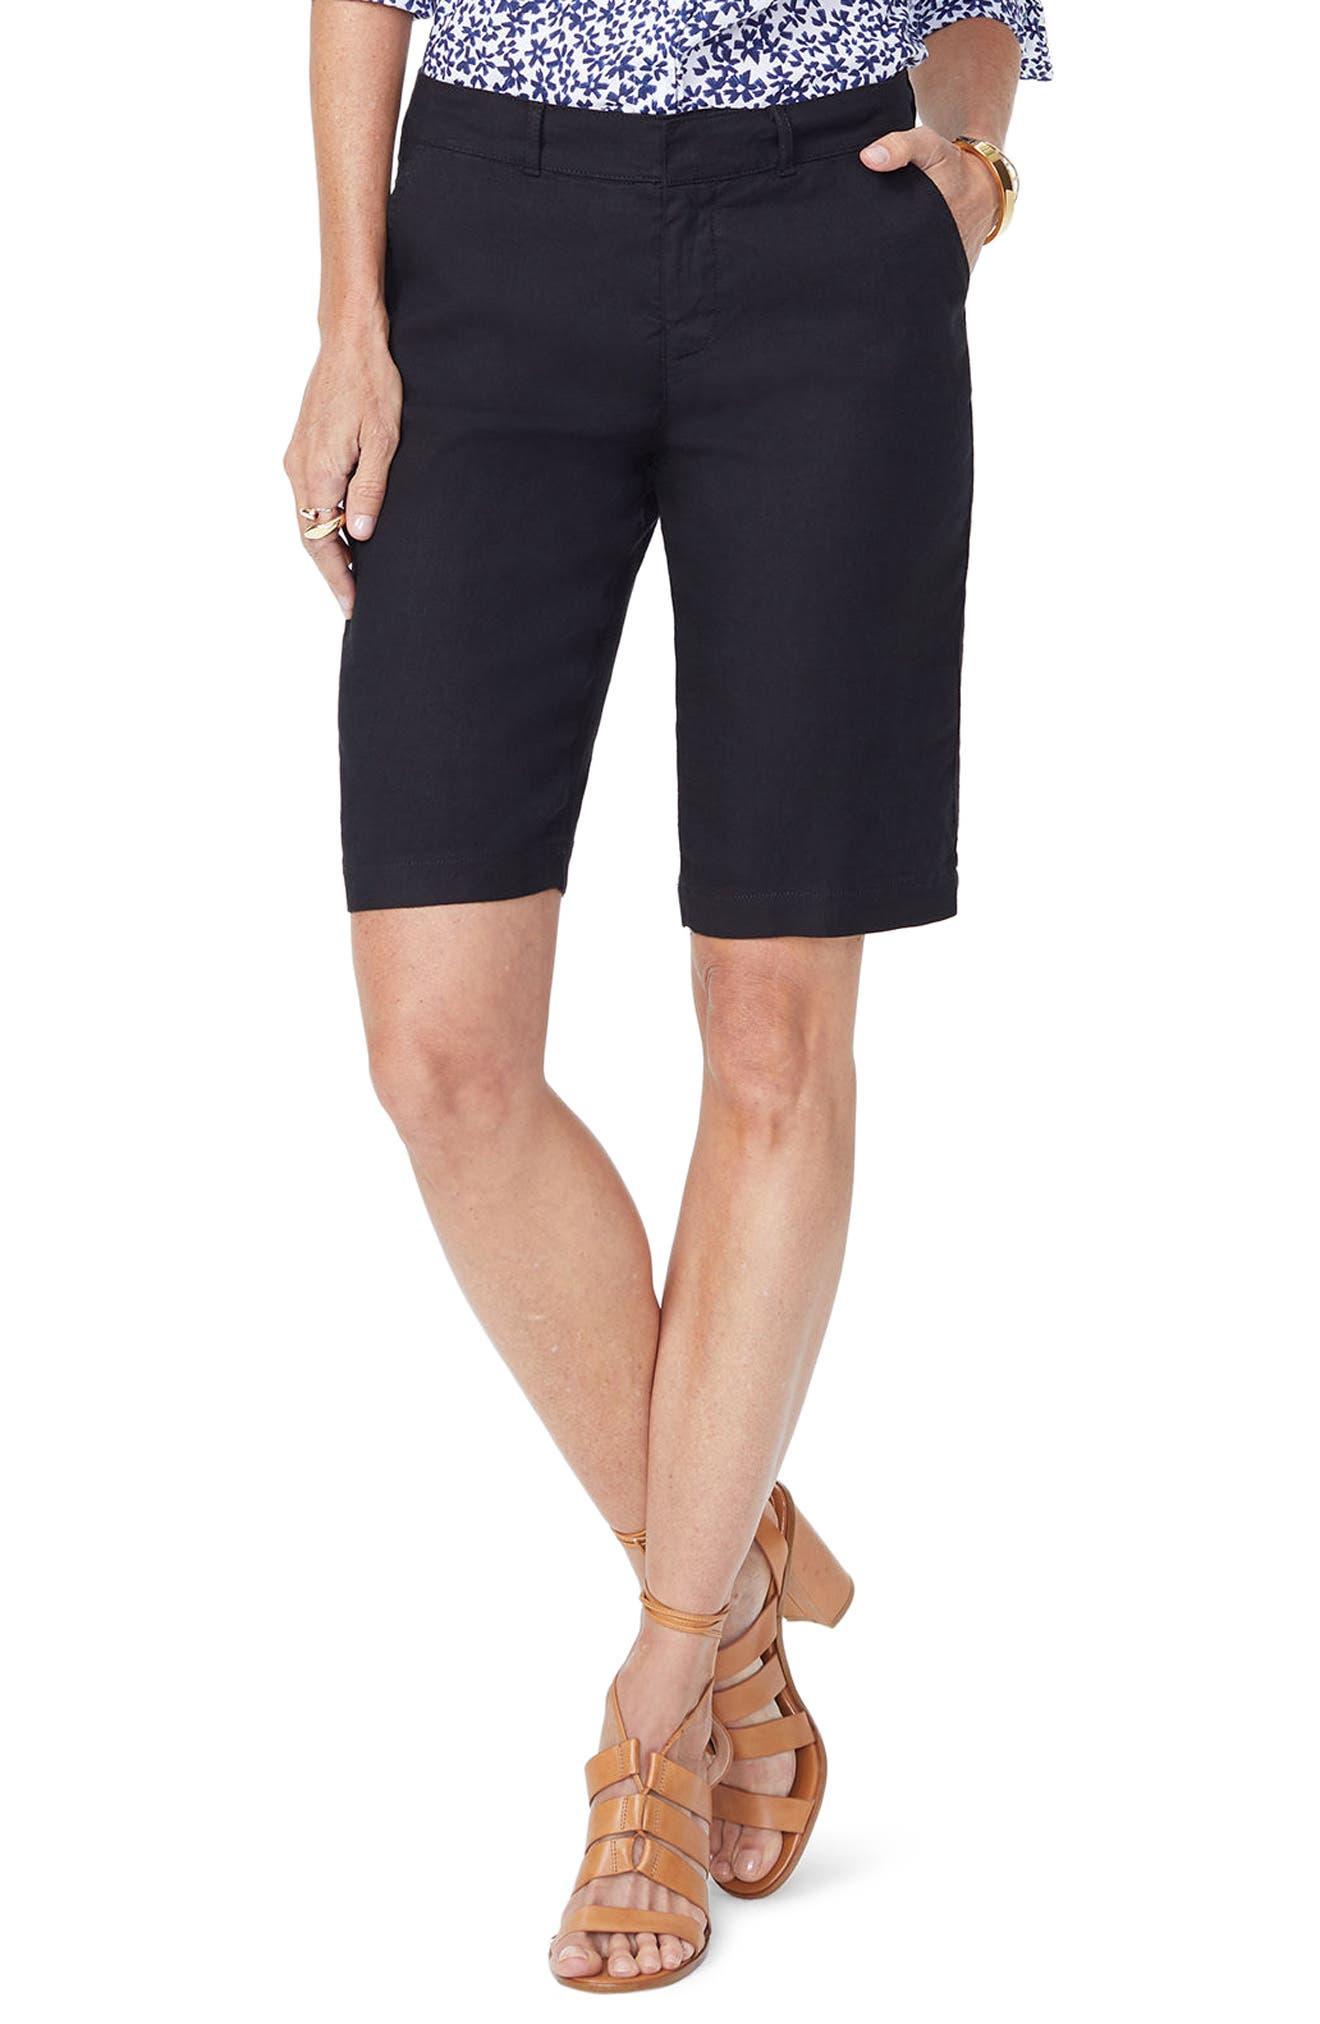 black linen shorts women's